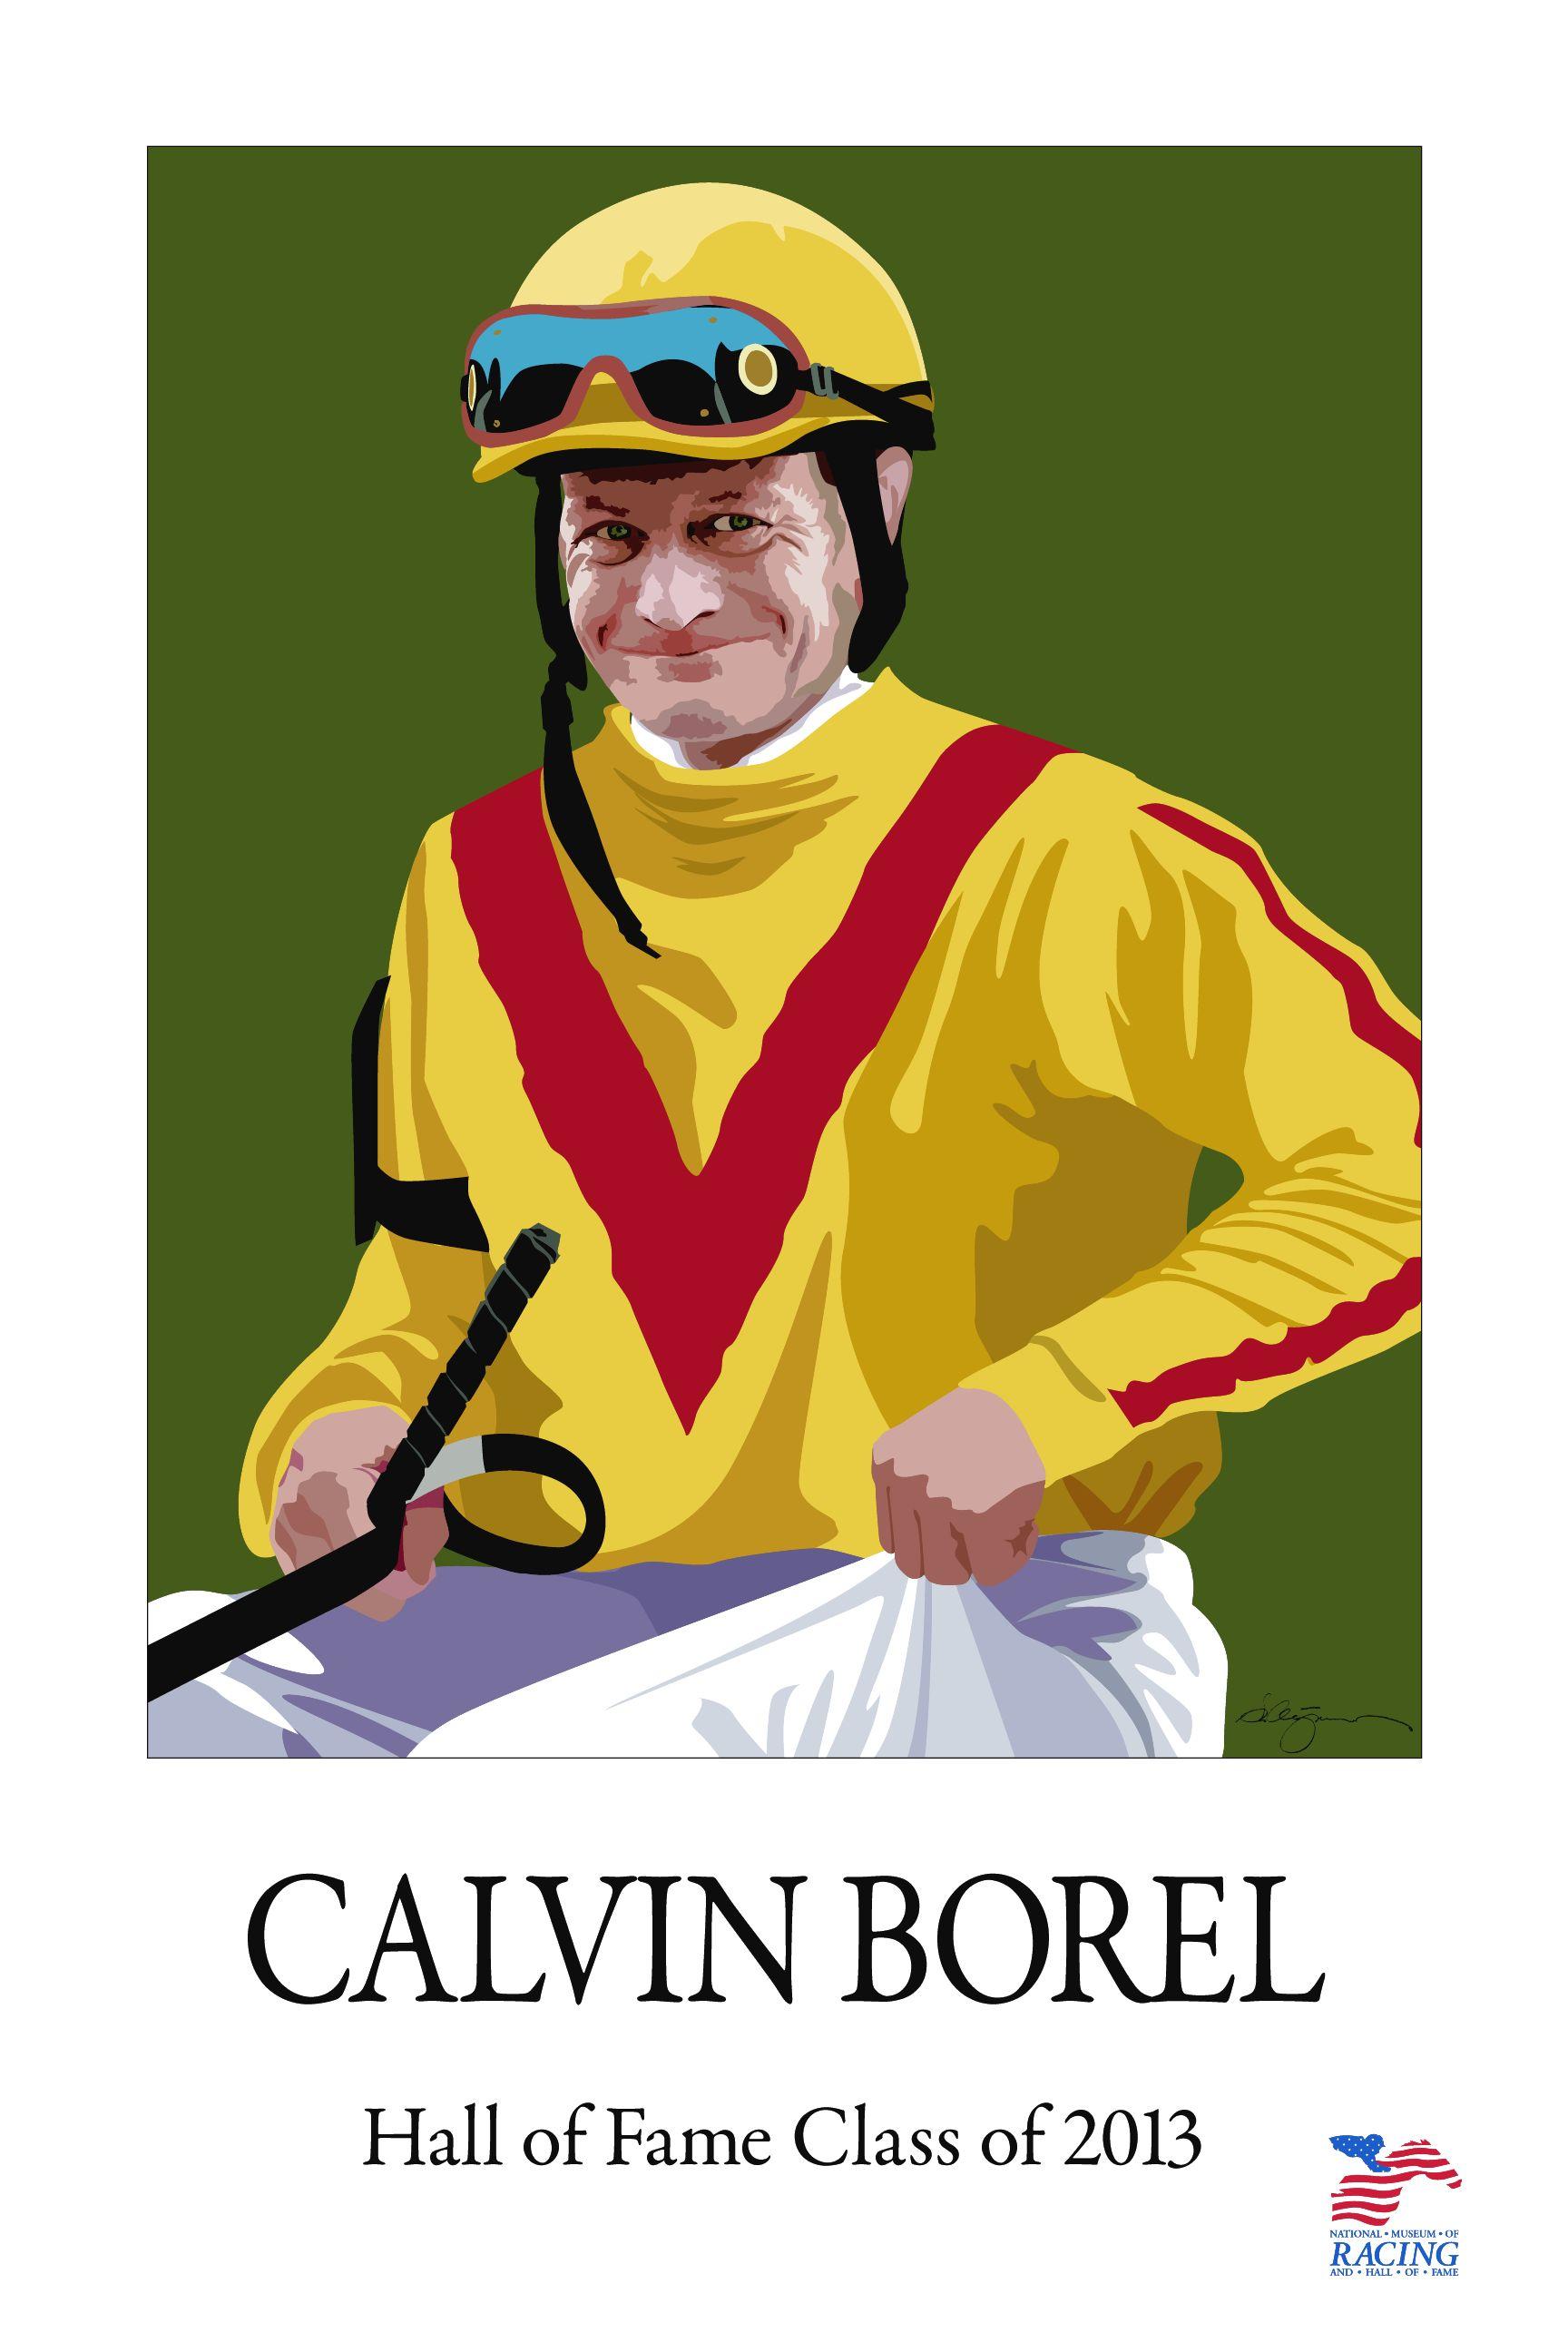 Greg Montgomery poster of Calvin Borel (Courtesy of artist)